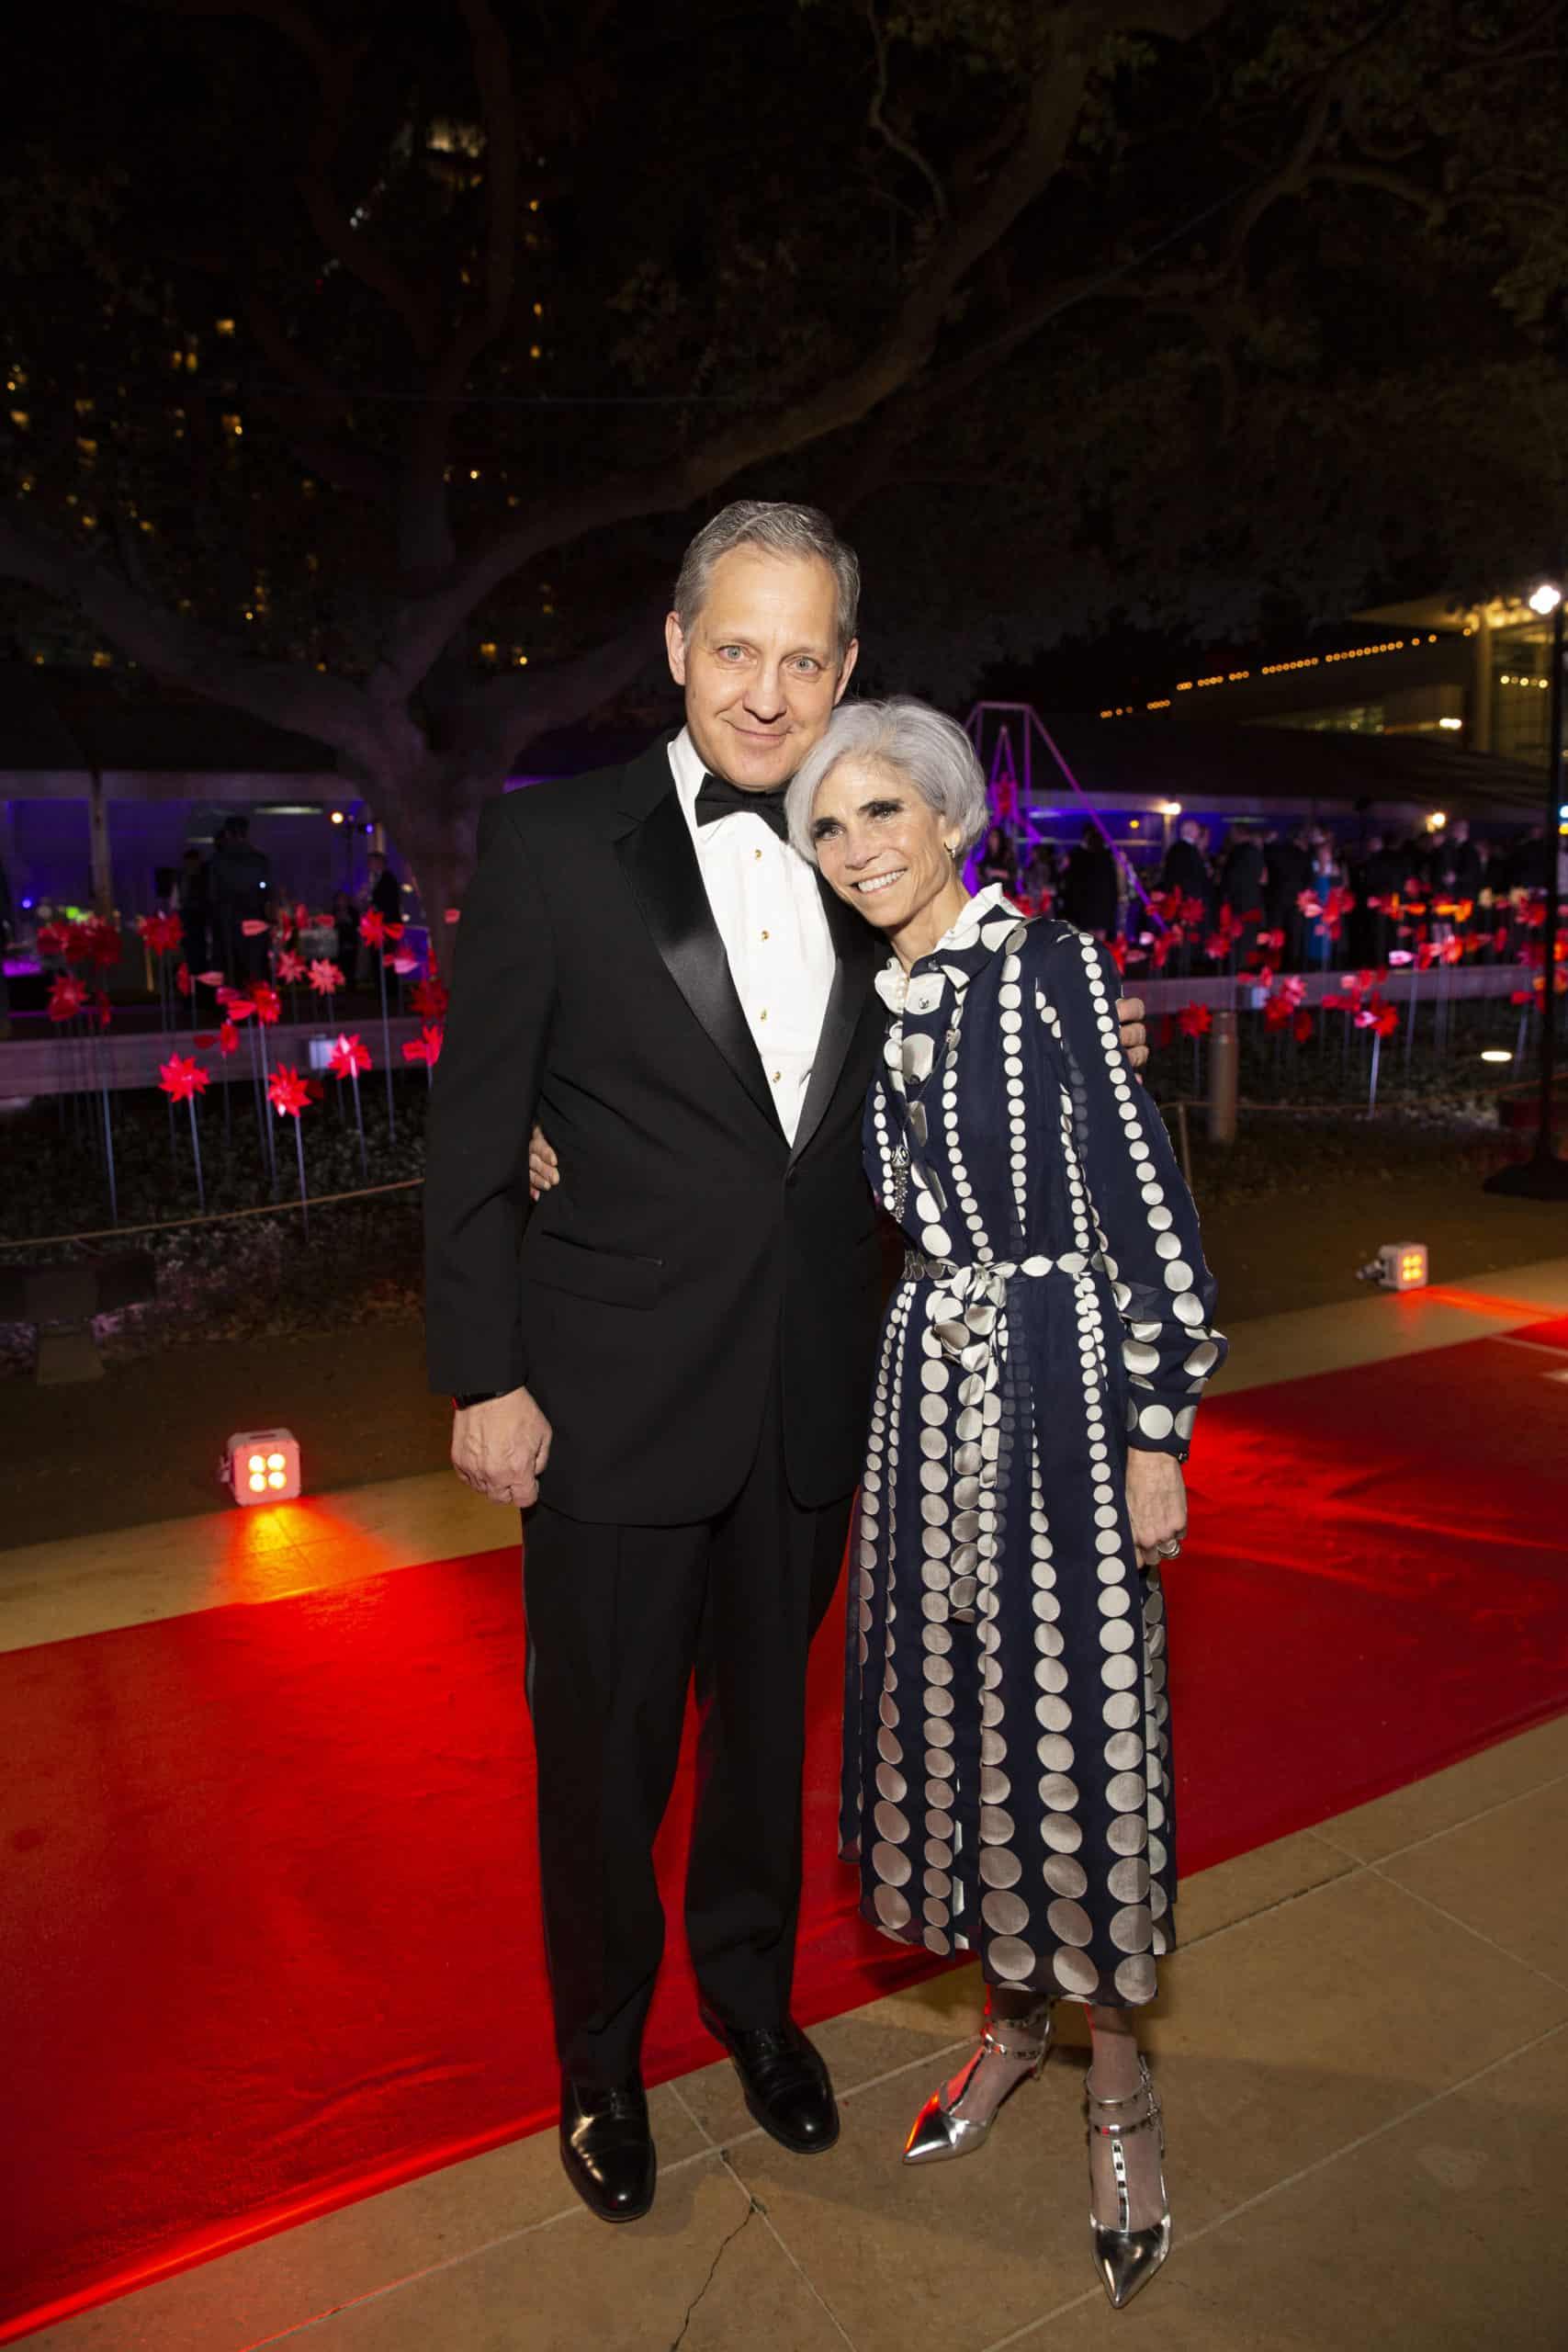 Scott and Judy Nyquist